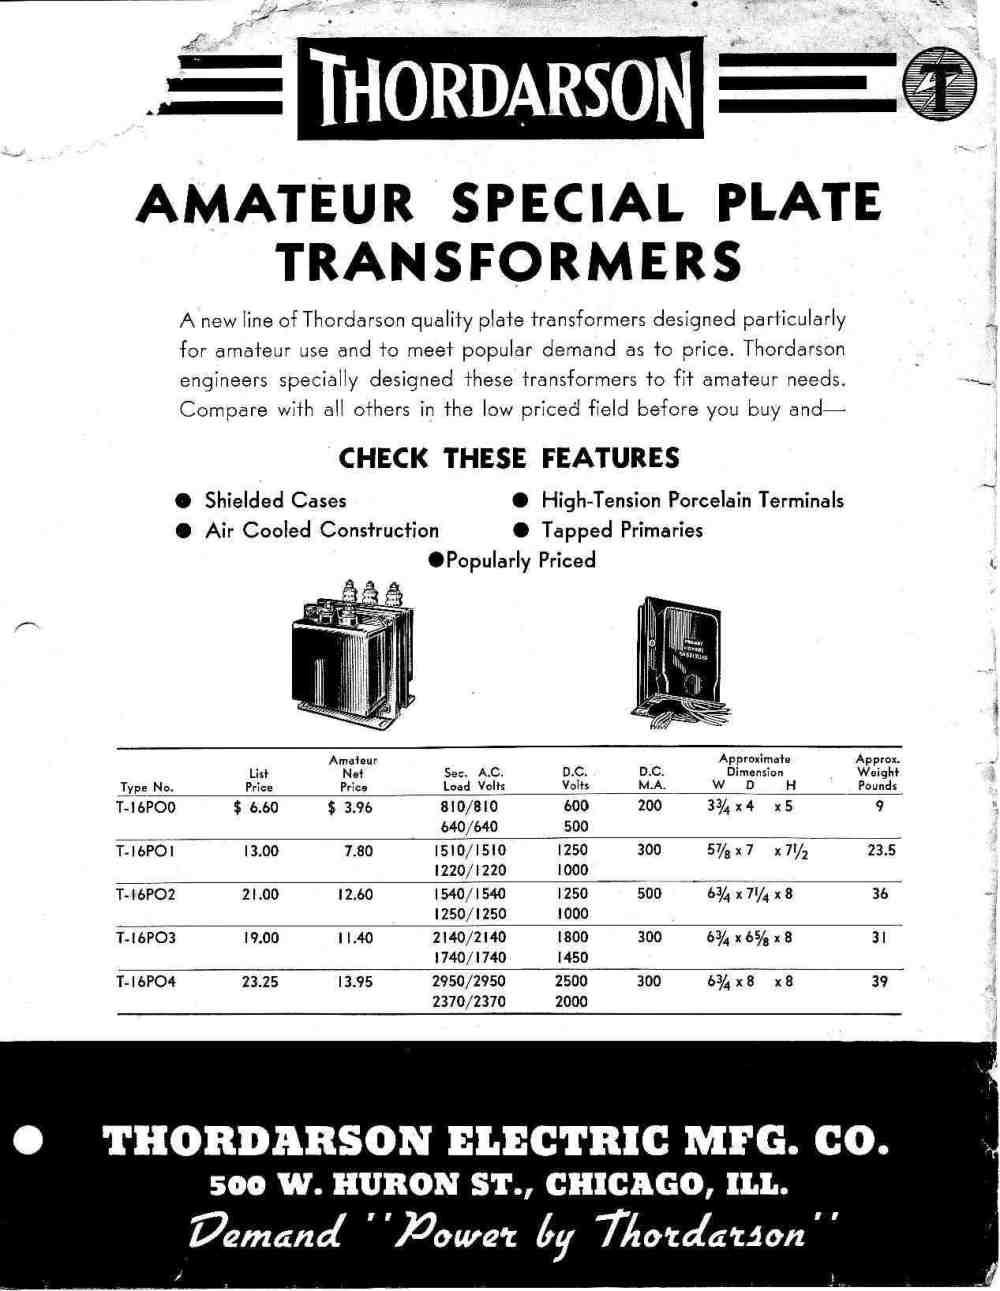 medium resolution of thordarson t 16 series amateur radio plate types